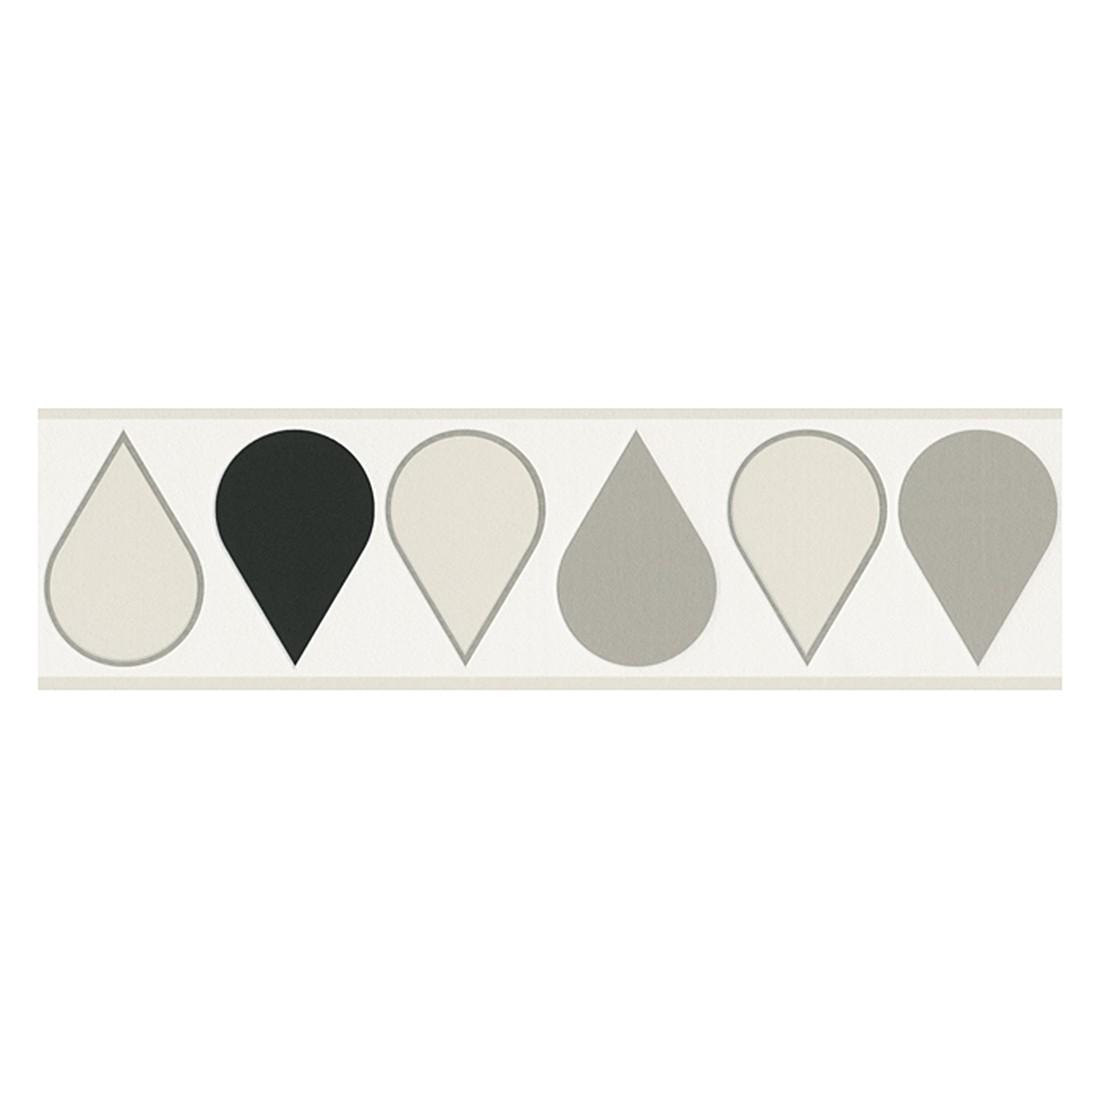 Bordüre Drop – weiß, schwarz, seidengrau, perlweiß – glatt, fein strukturiert, Raffi online bestellen